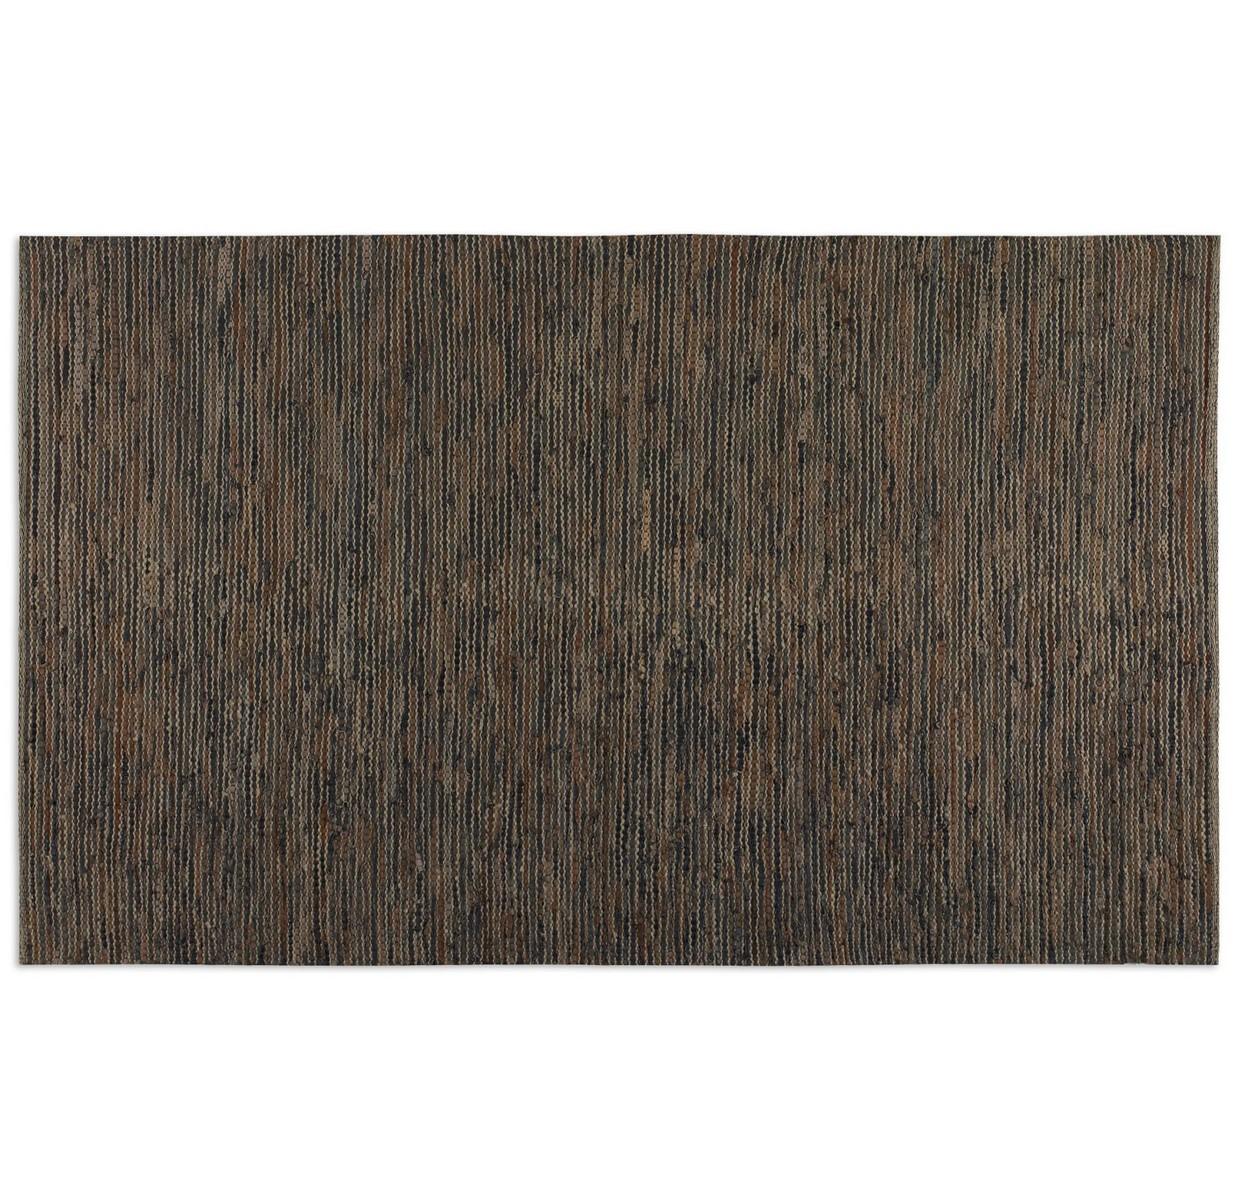 Uttermost Culver 5 X 8 Rug - Brown Rust